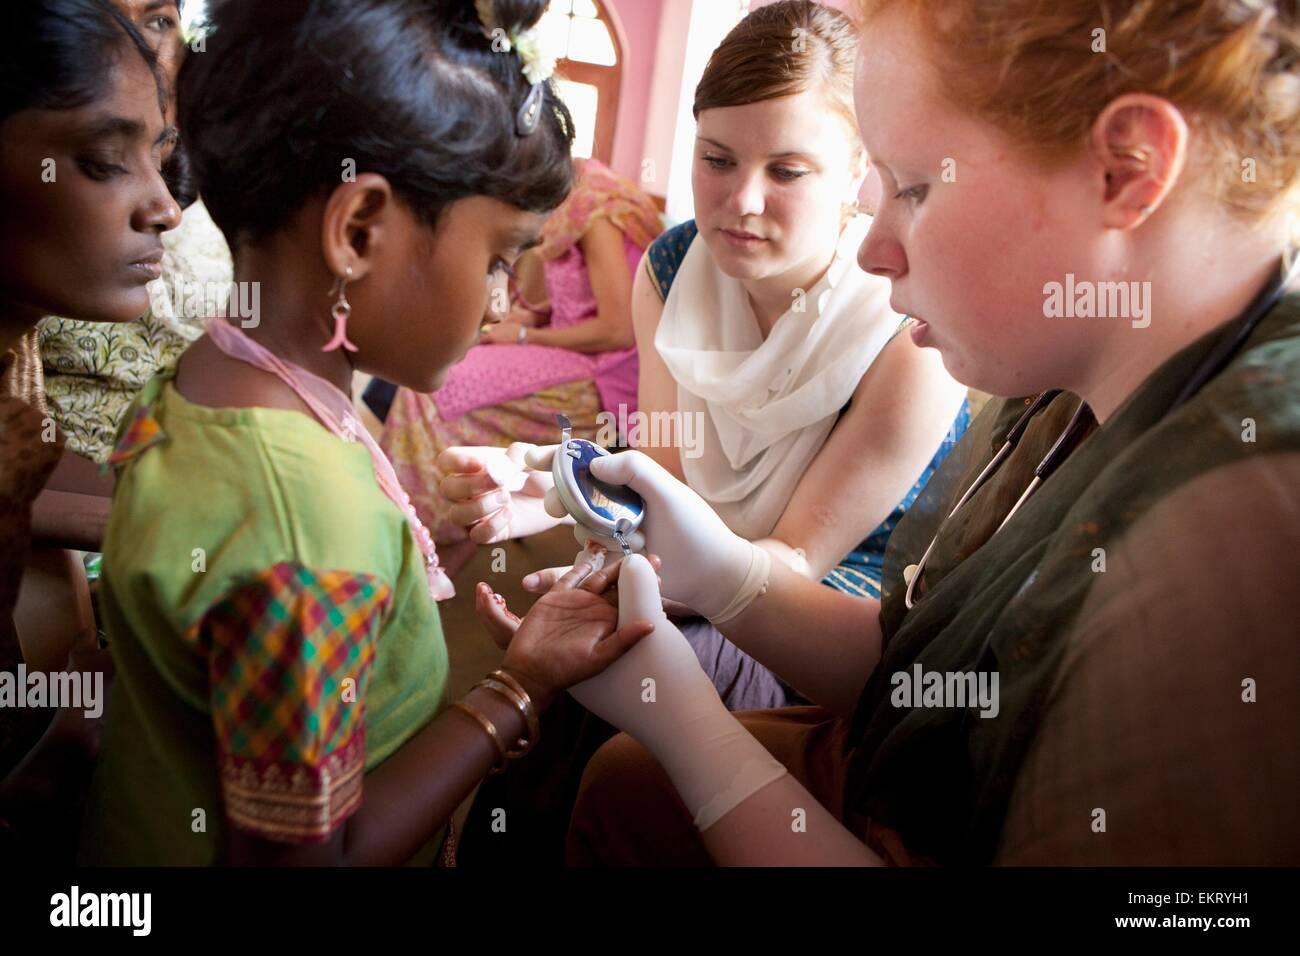 A Nurse Checks The Blood Sugar Level Of A Girl With Diabetes; Sathyamangalam, Tamil Nadu, India - Stock Image